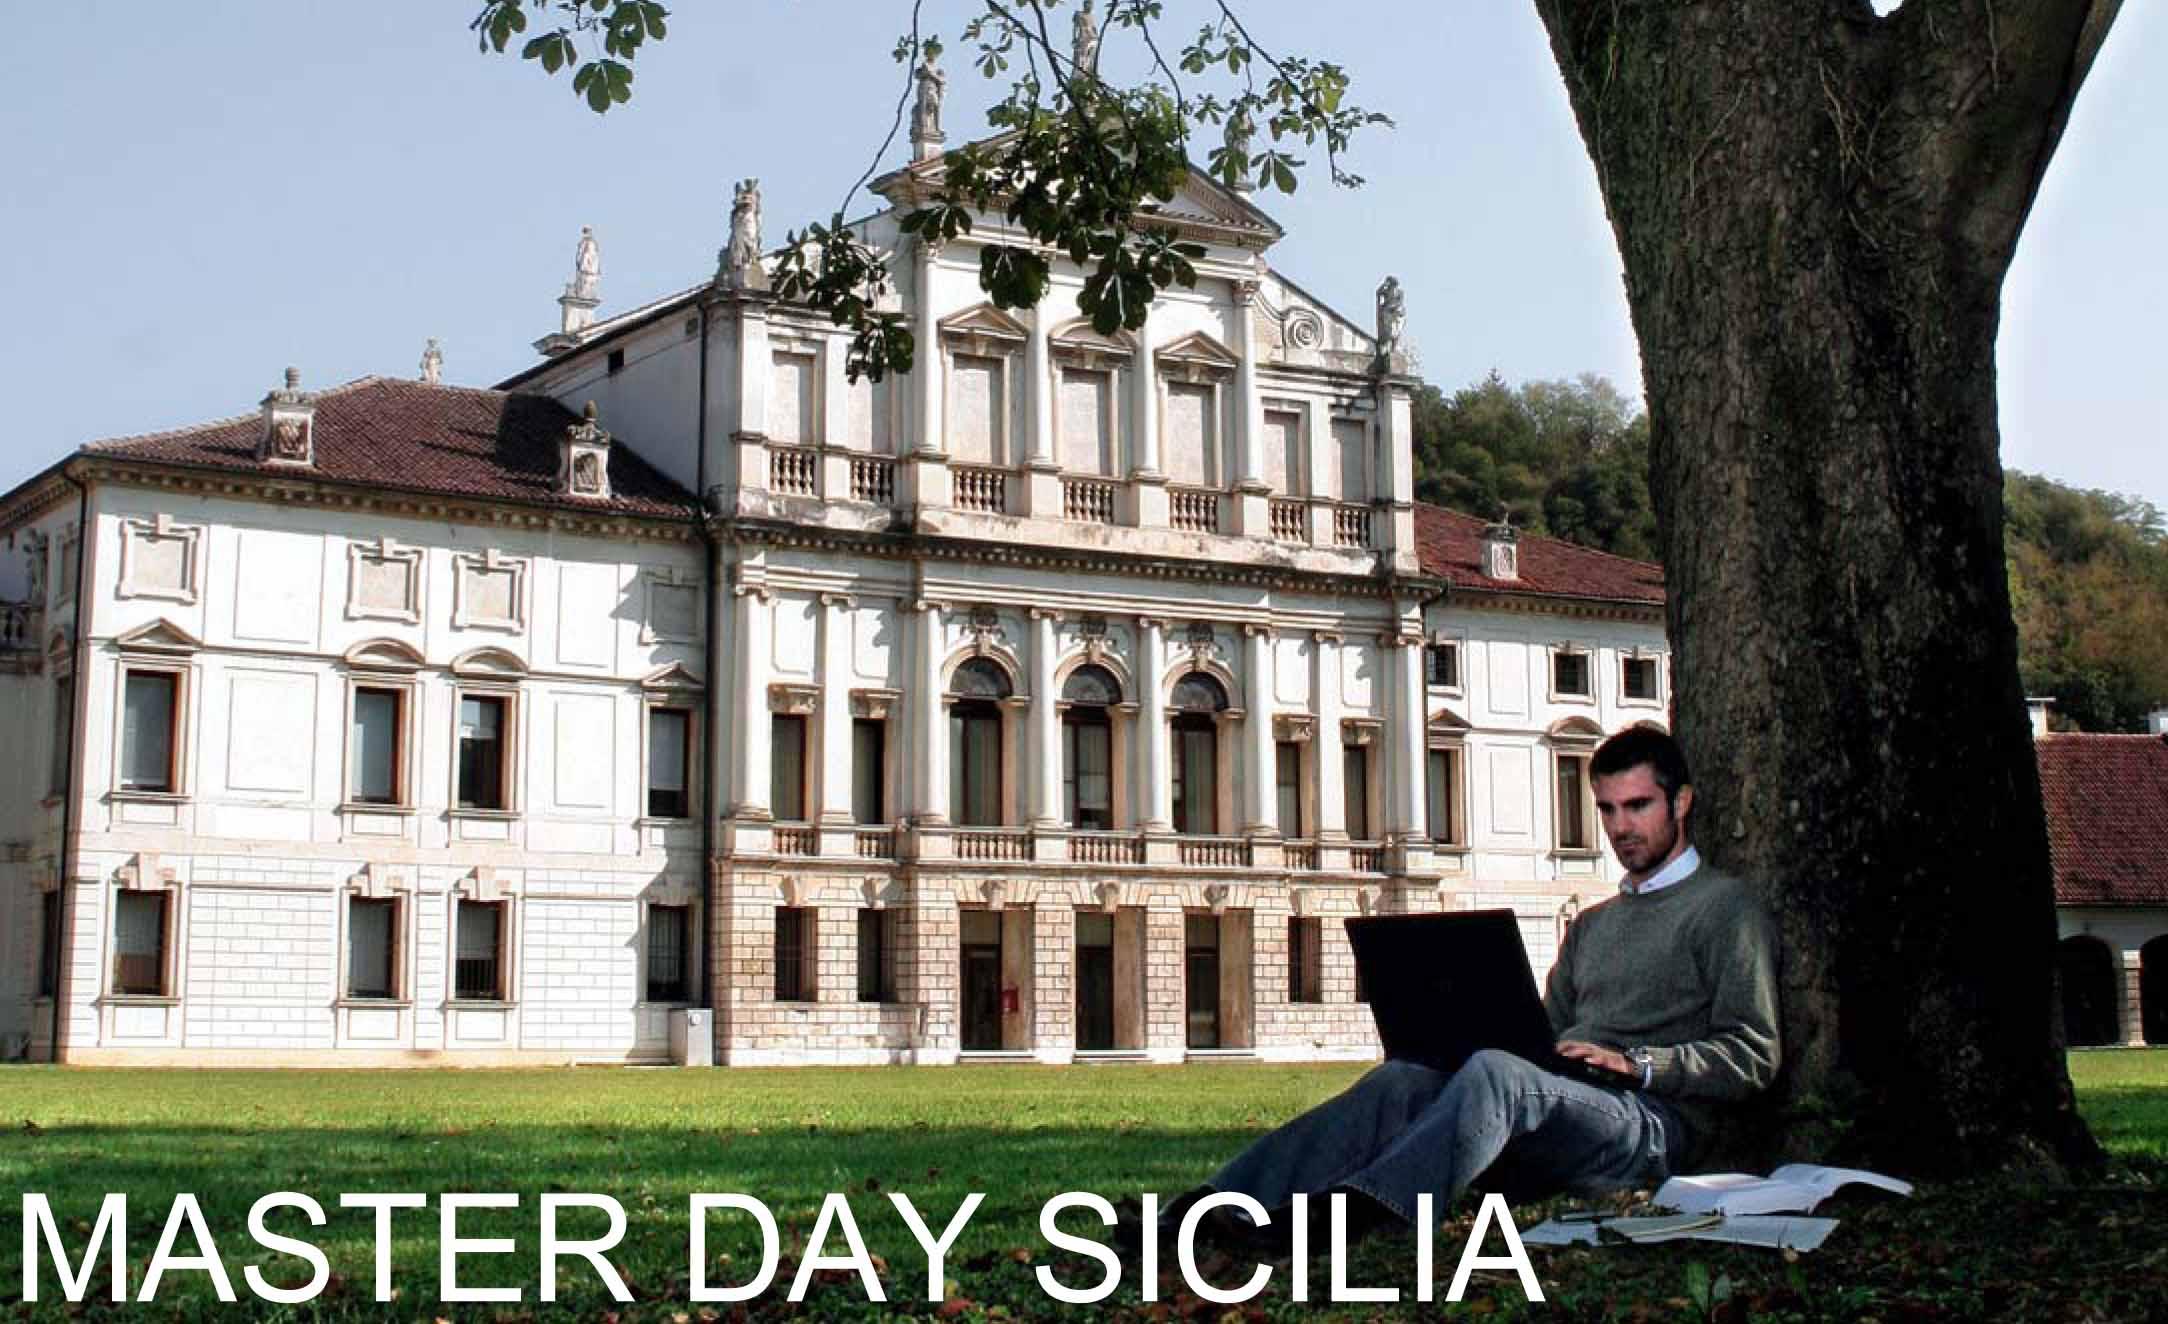 Microsoft PowerPoint - #403828 v2 - master Day Catania - 16 otto